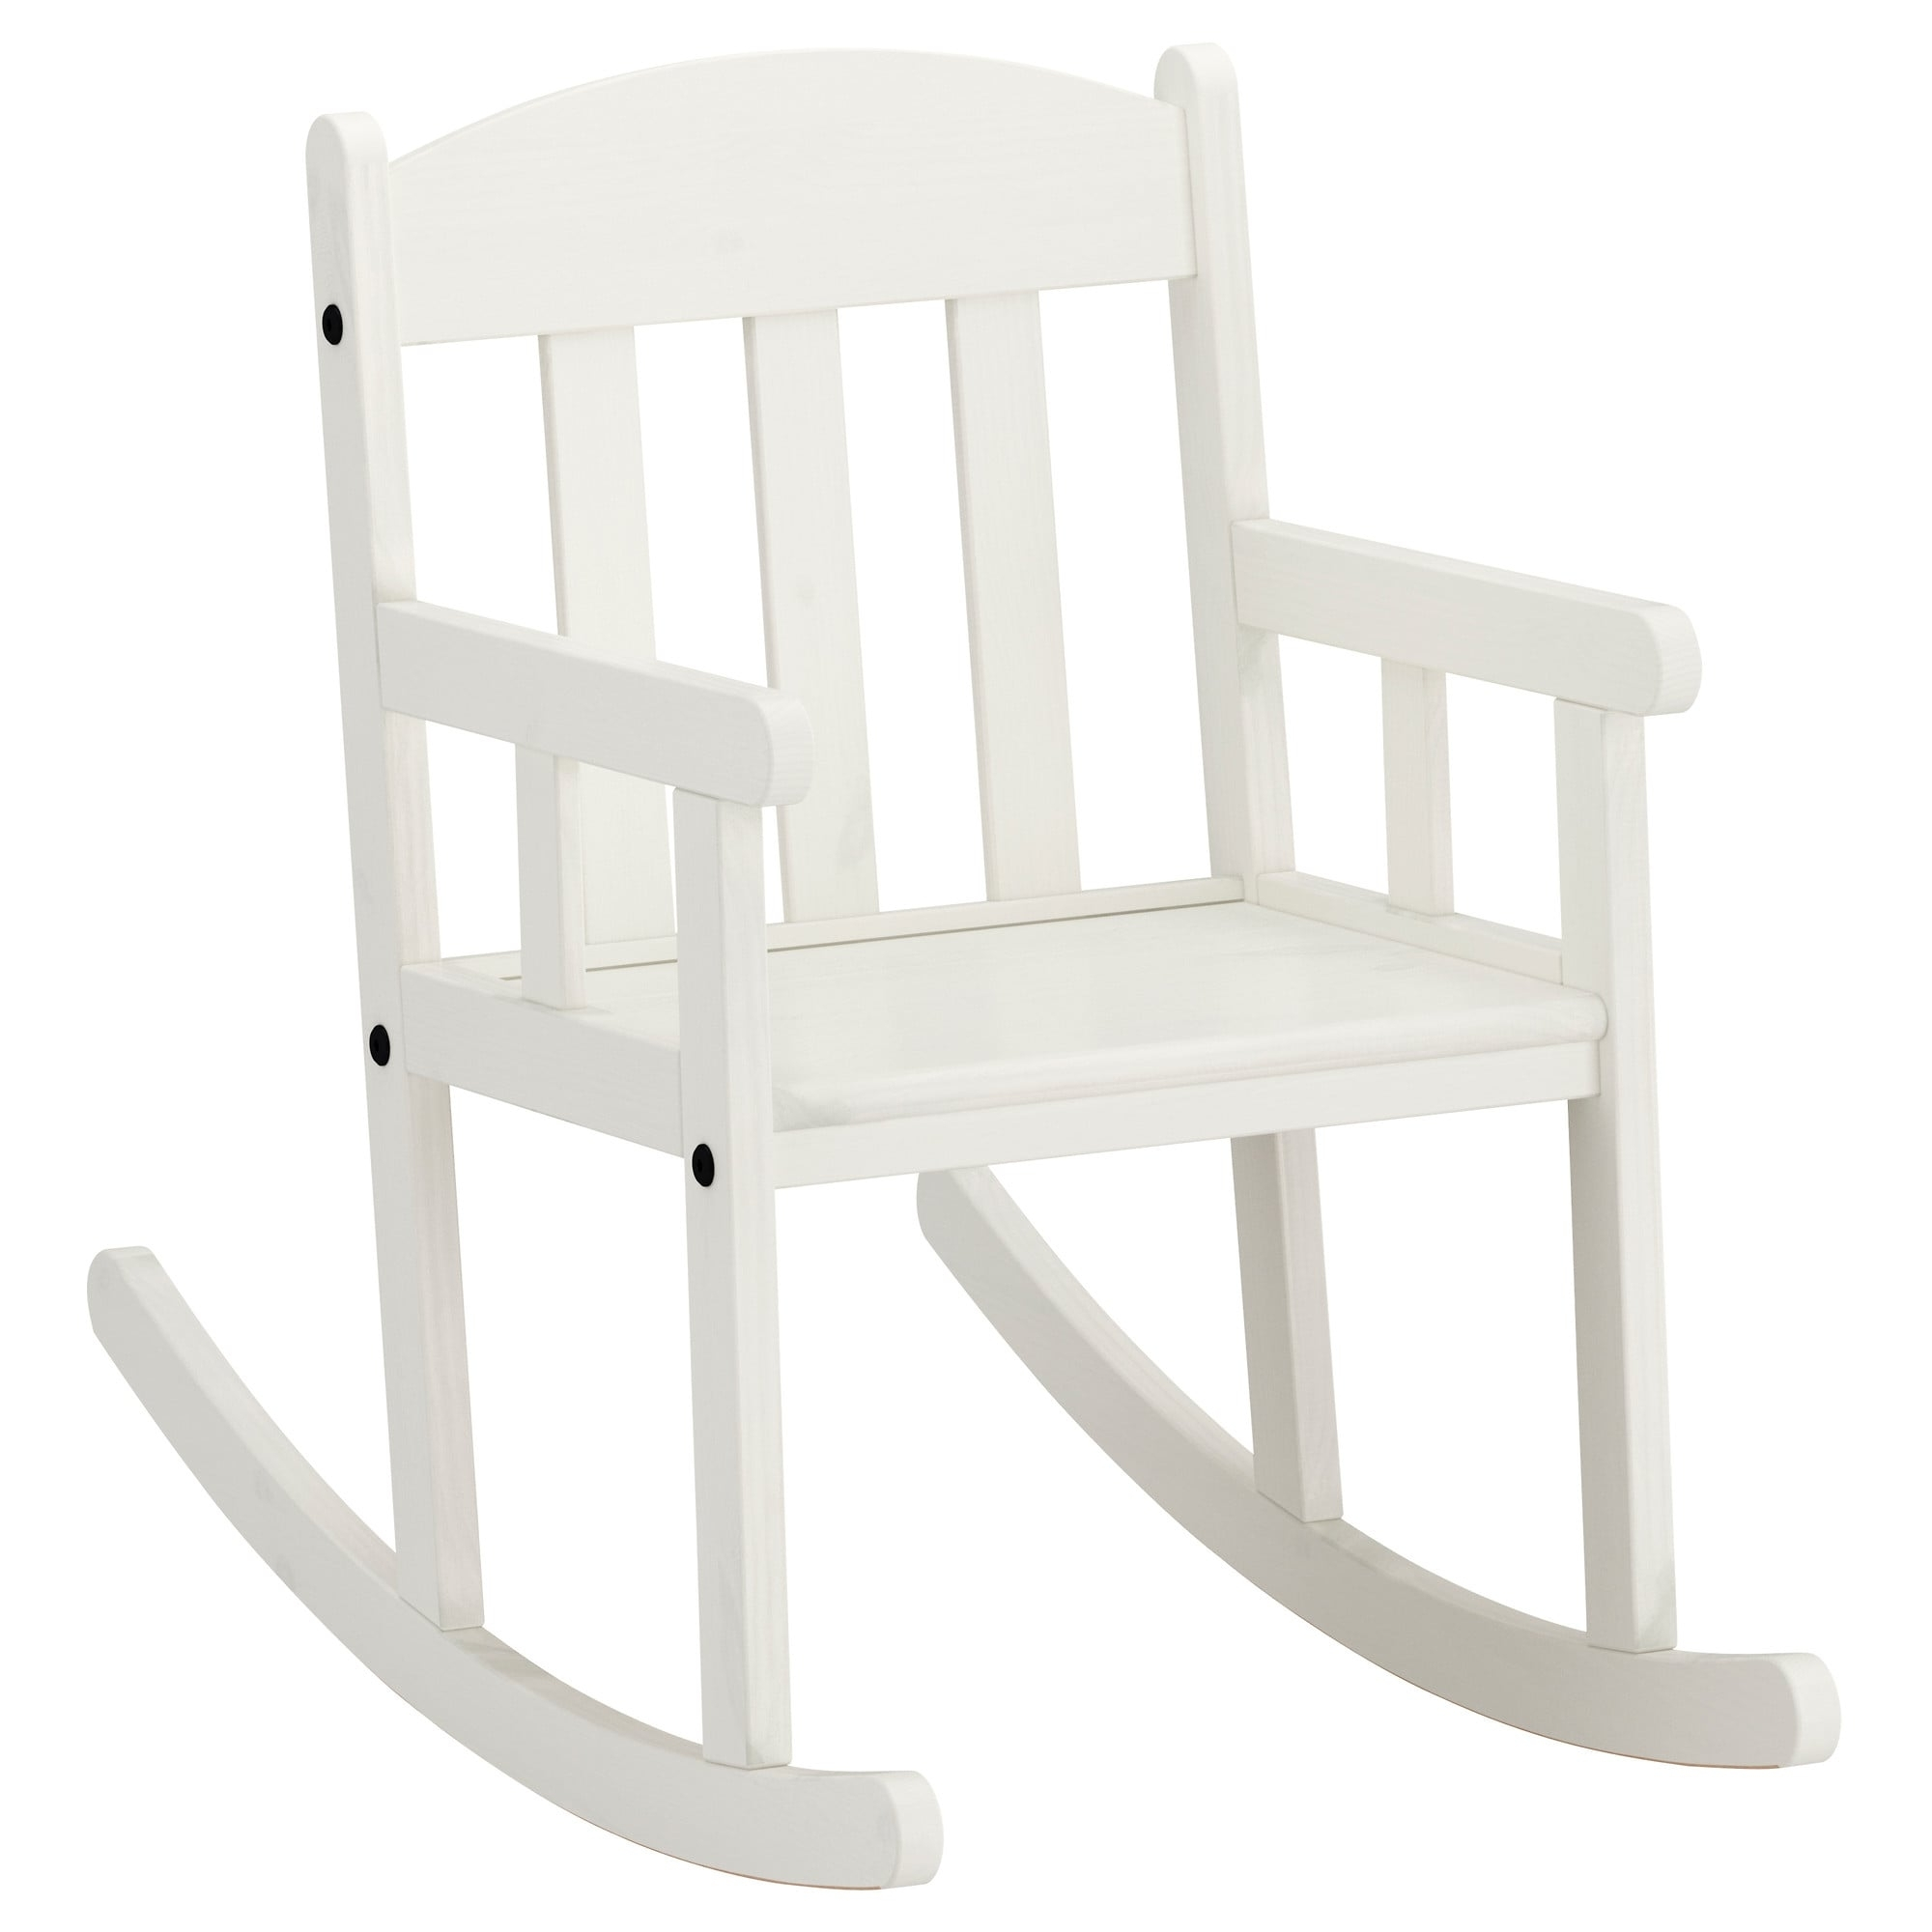 Sundvik Rocking Chair White – Ikea Regarding Famous Ireland Rocking Chairs (View 19 of 20)